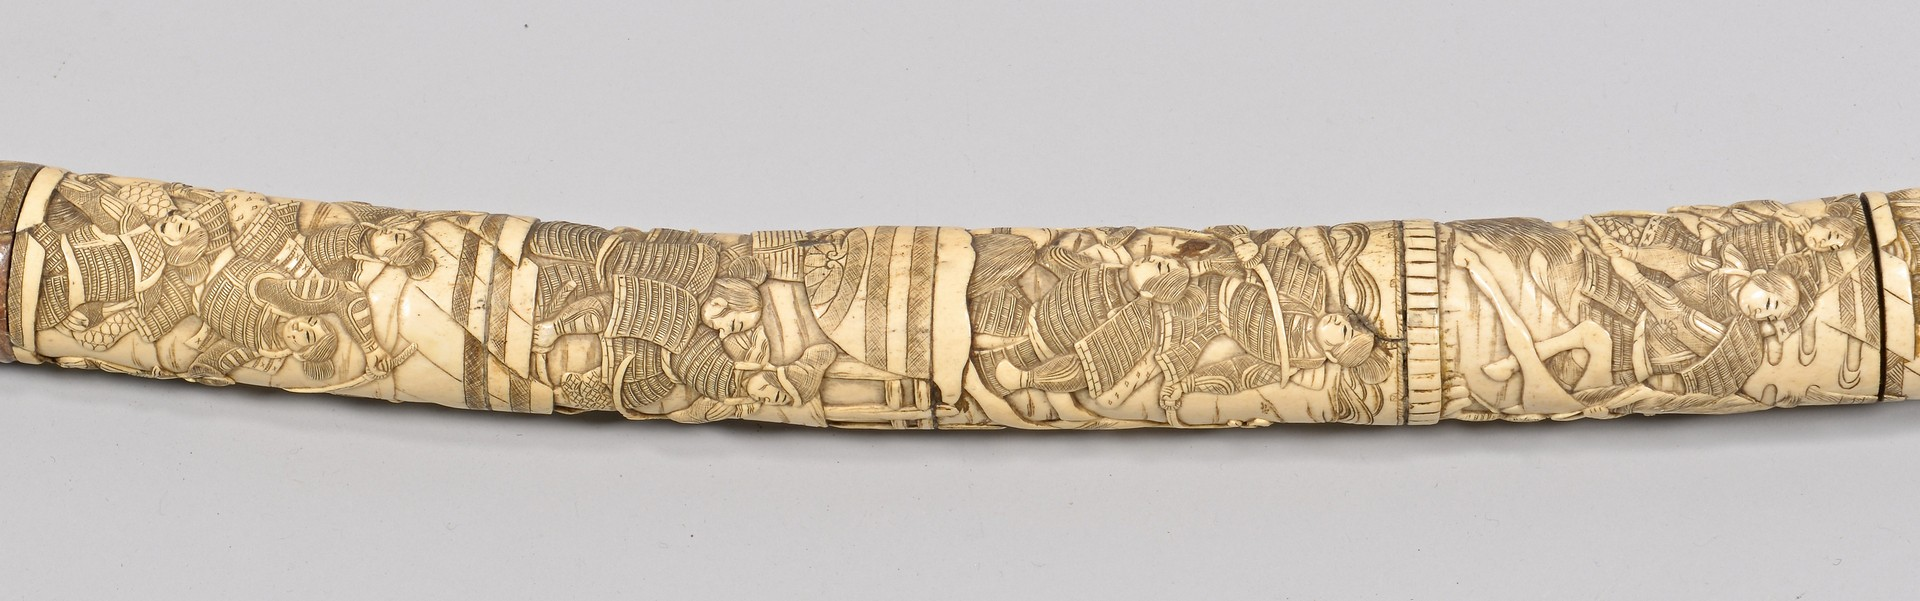 Lot 4010083: Japanese Sword w/ Carved Bone Scabbard